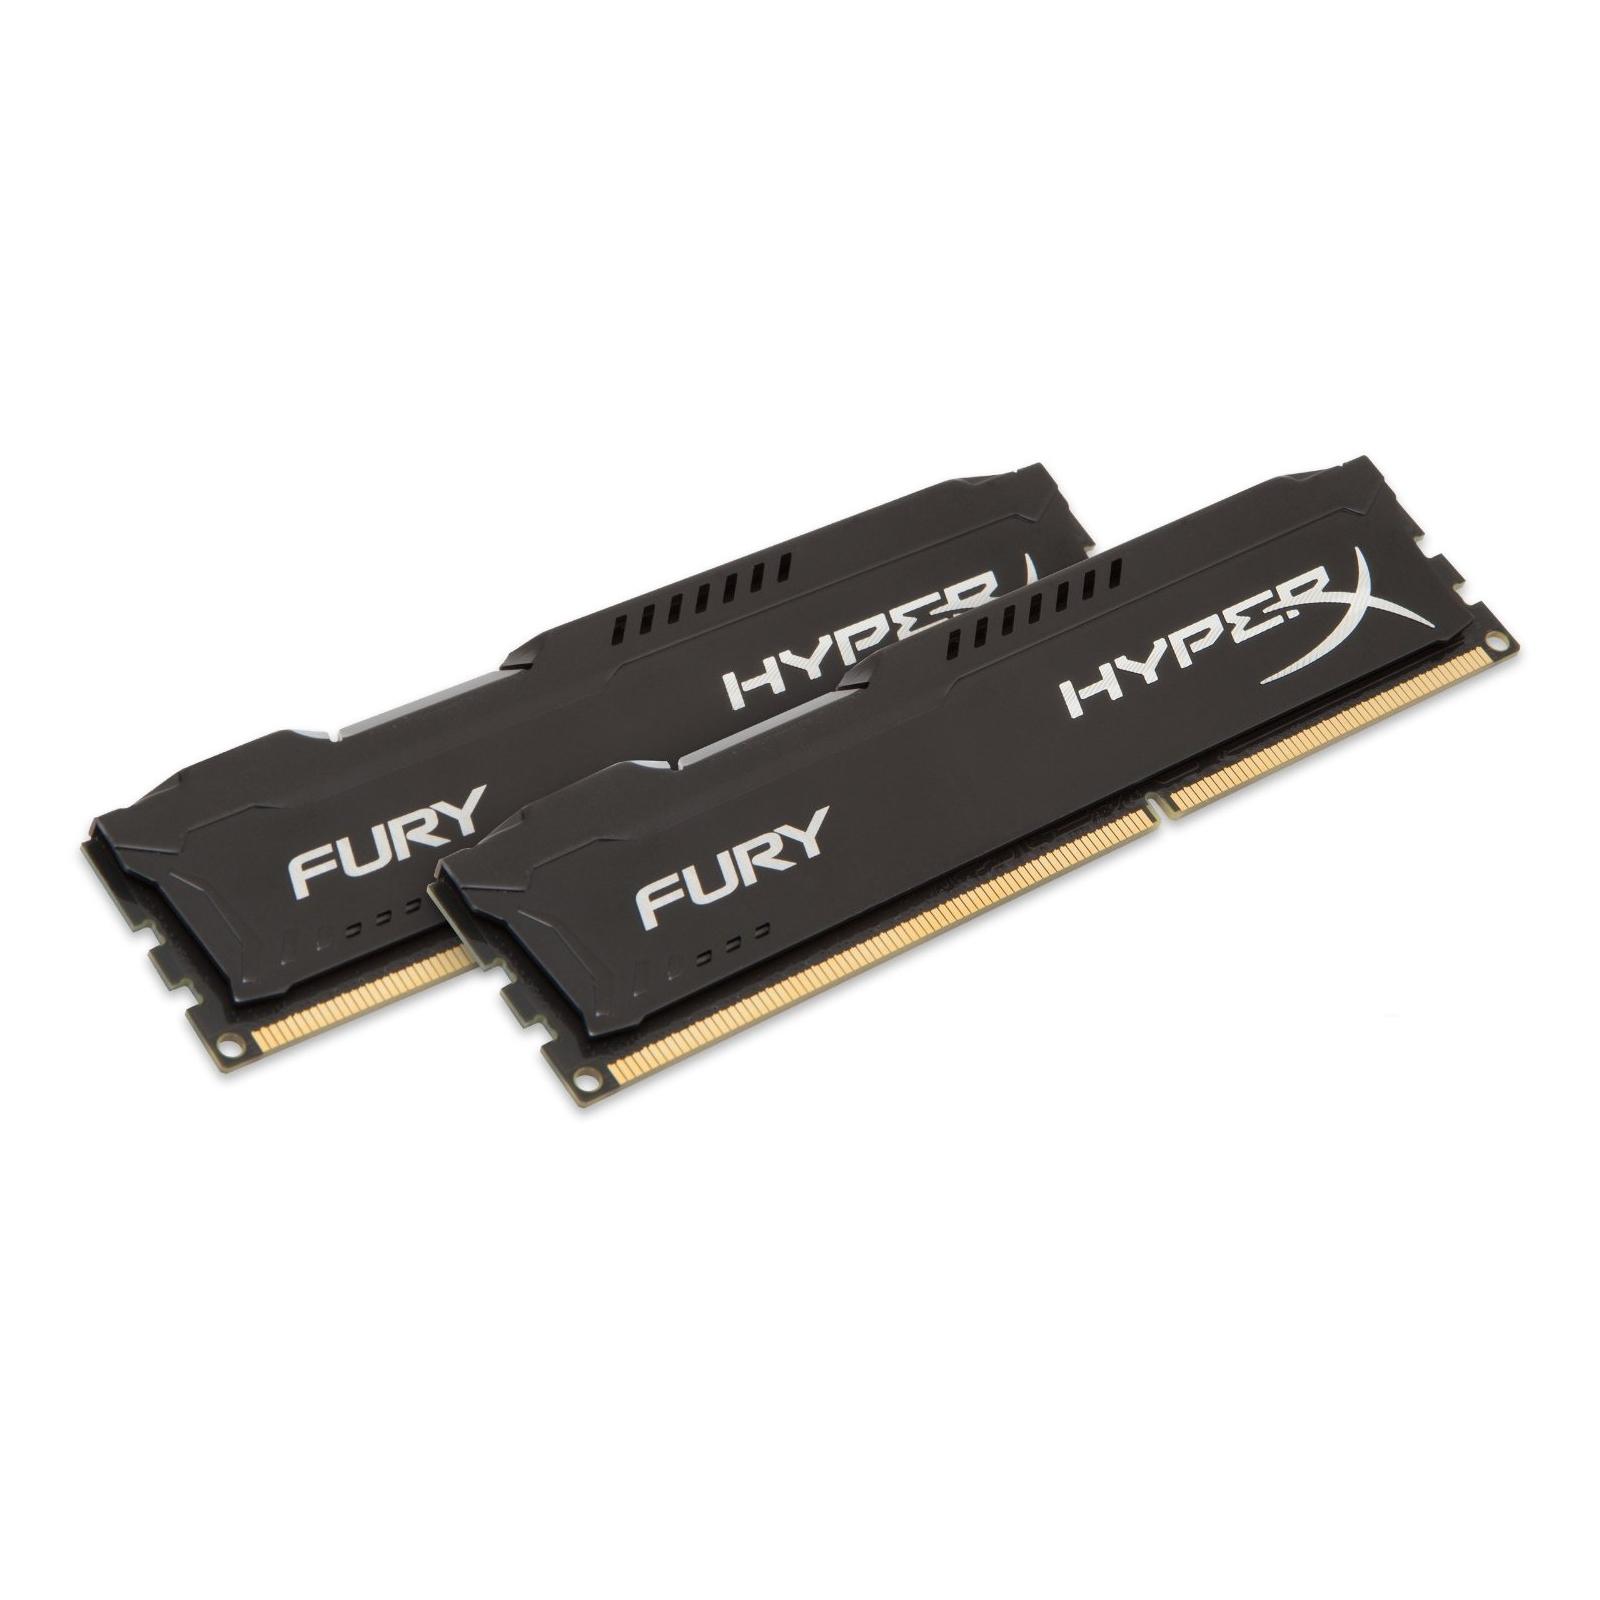 Модуль памяти для компьютера DDR3 8Gb (2x4GB) 1600 MHz HyperX Fury Black Kingston (HX316C10FBK2/8) изображение 2